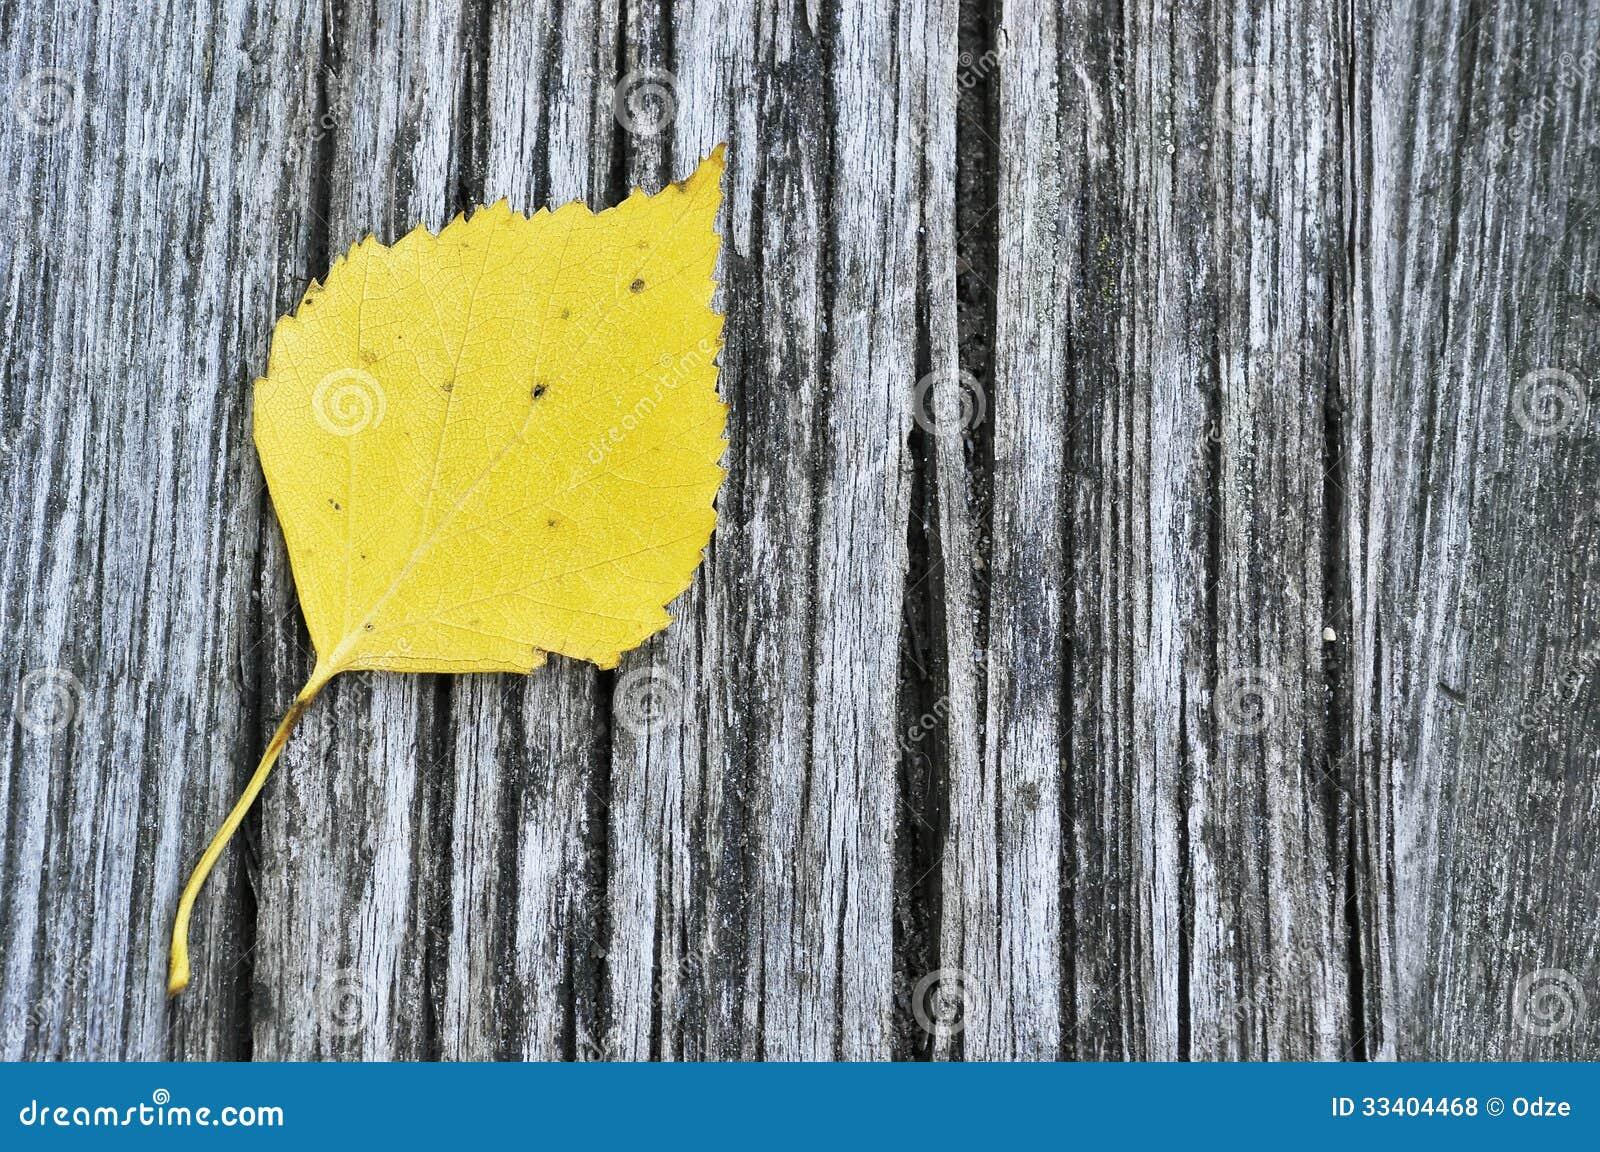 Feuille de bouleau jaune photos libres de droits image - Feuille de bouleau photo ...